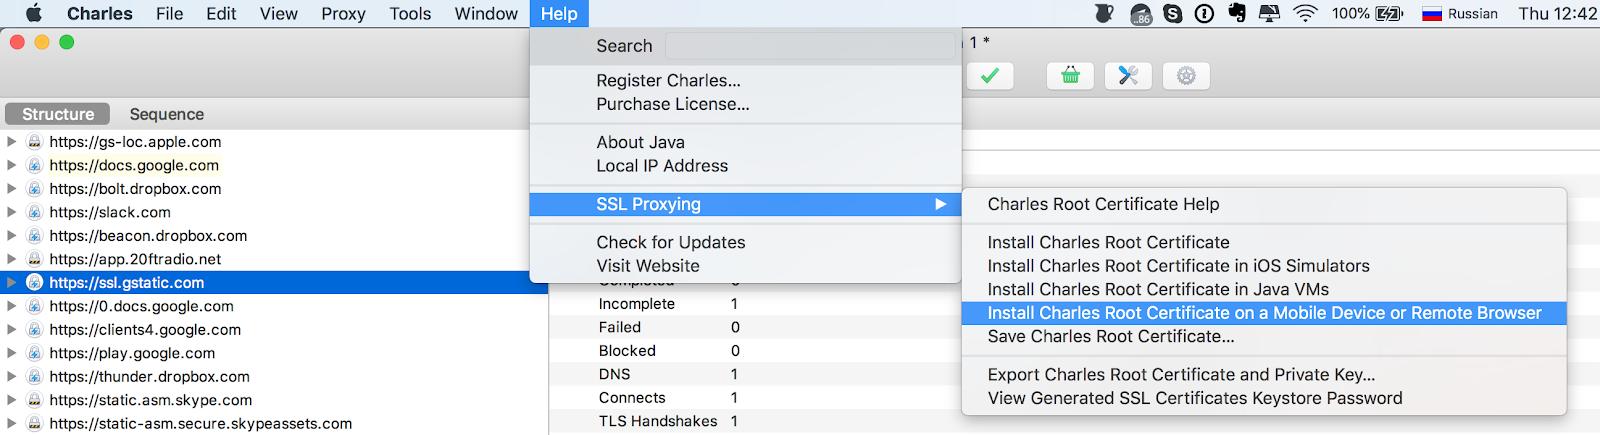 Как сниффить HTTPS-трафик iOS-устройства - 7